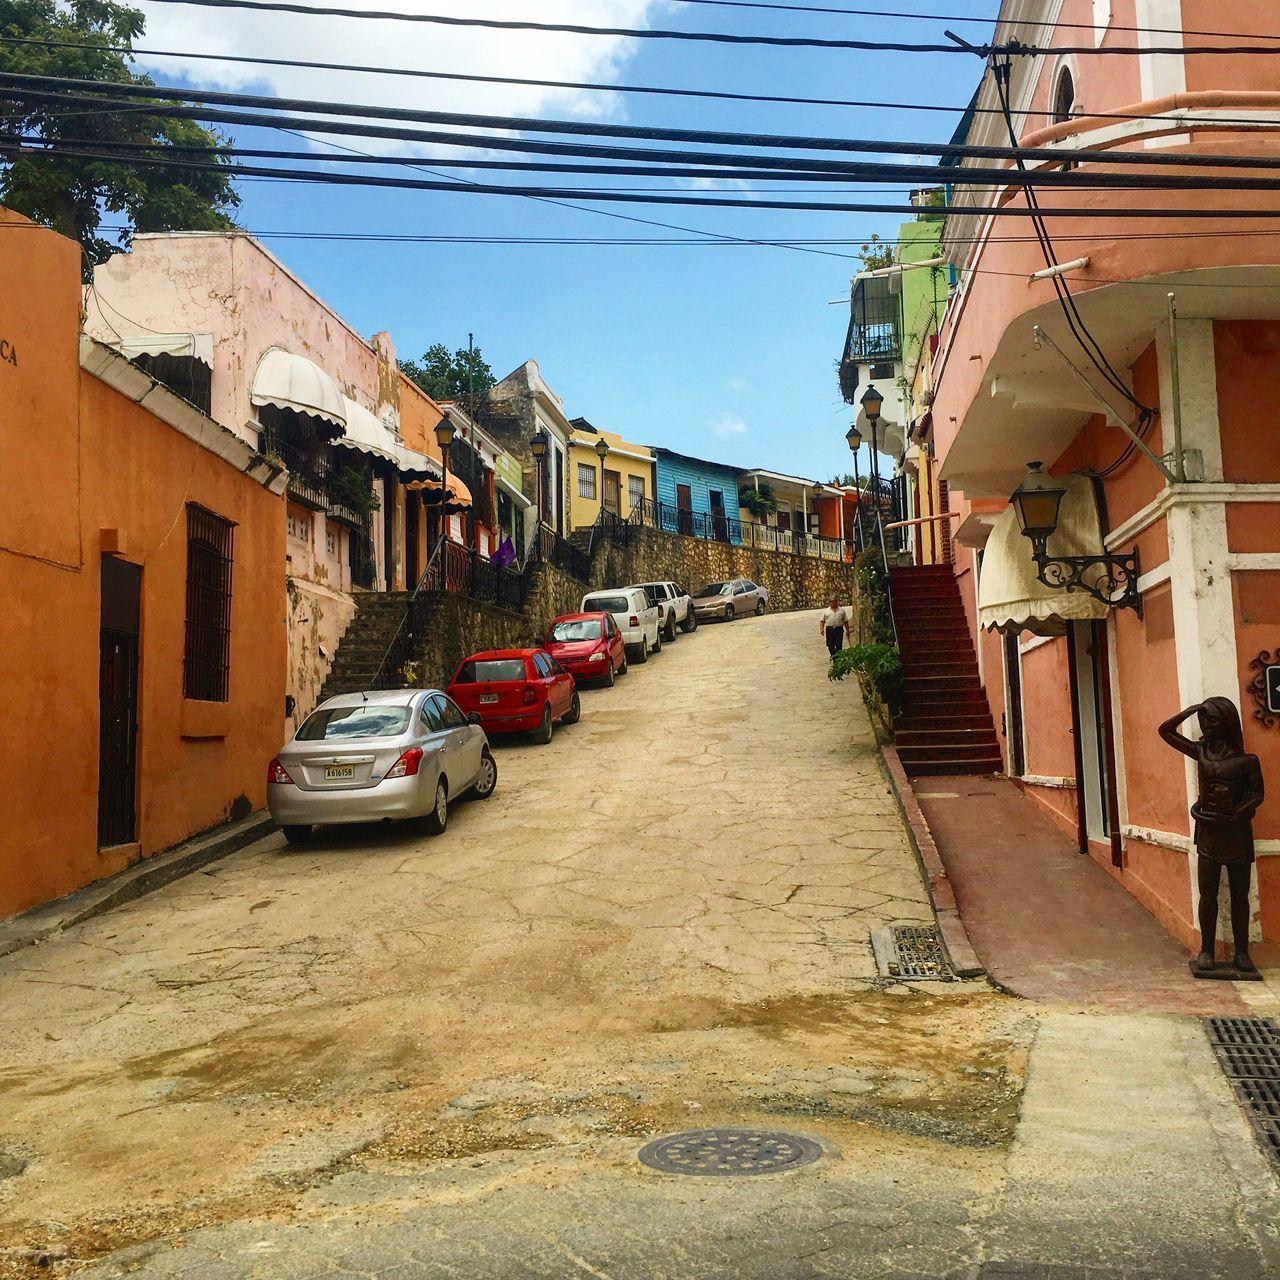 Dominican Republic, Vacation Spots